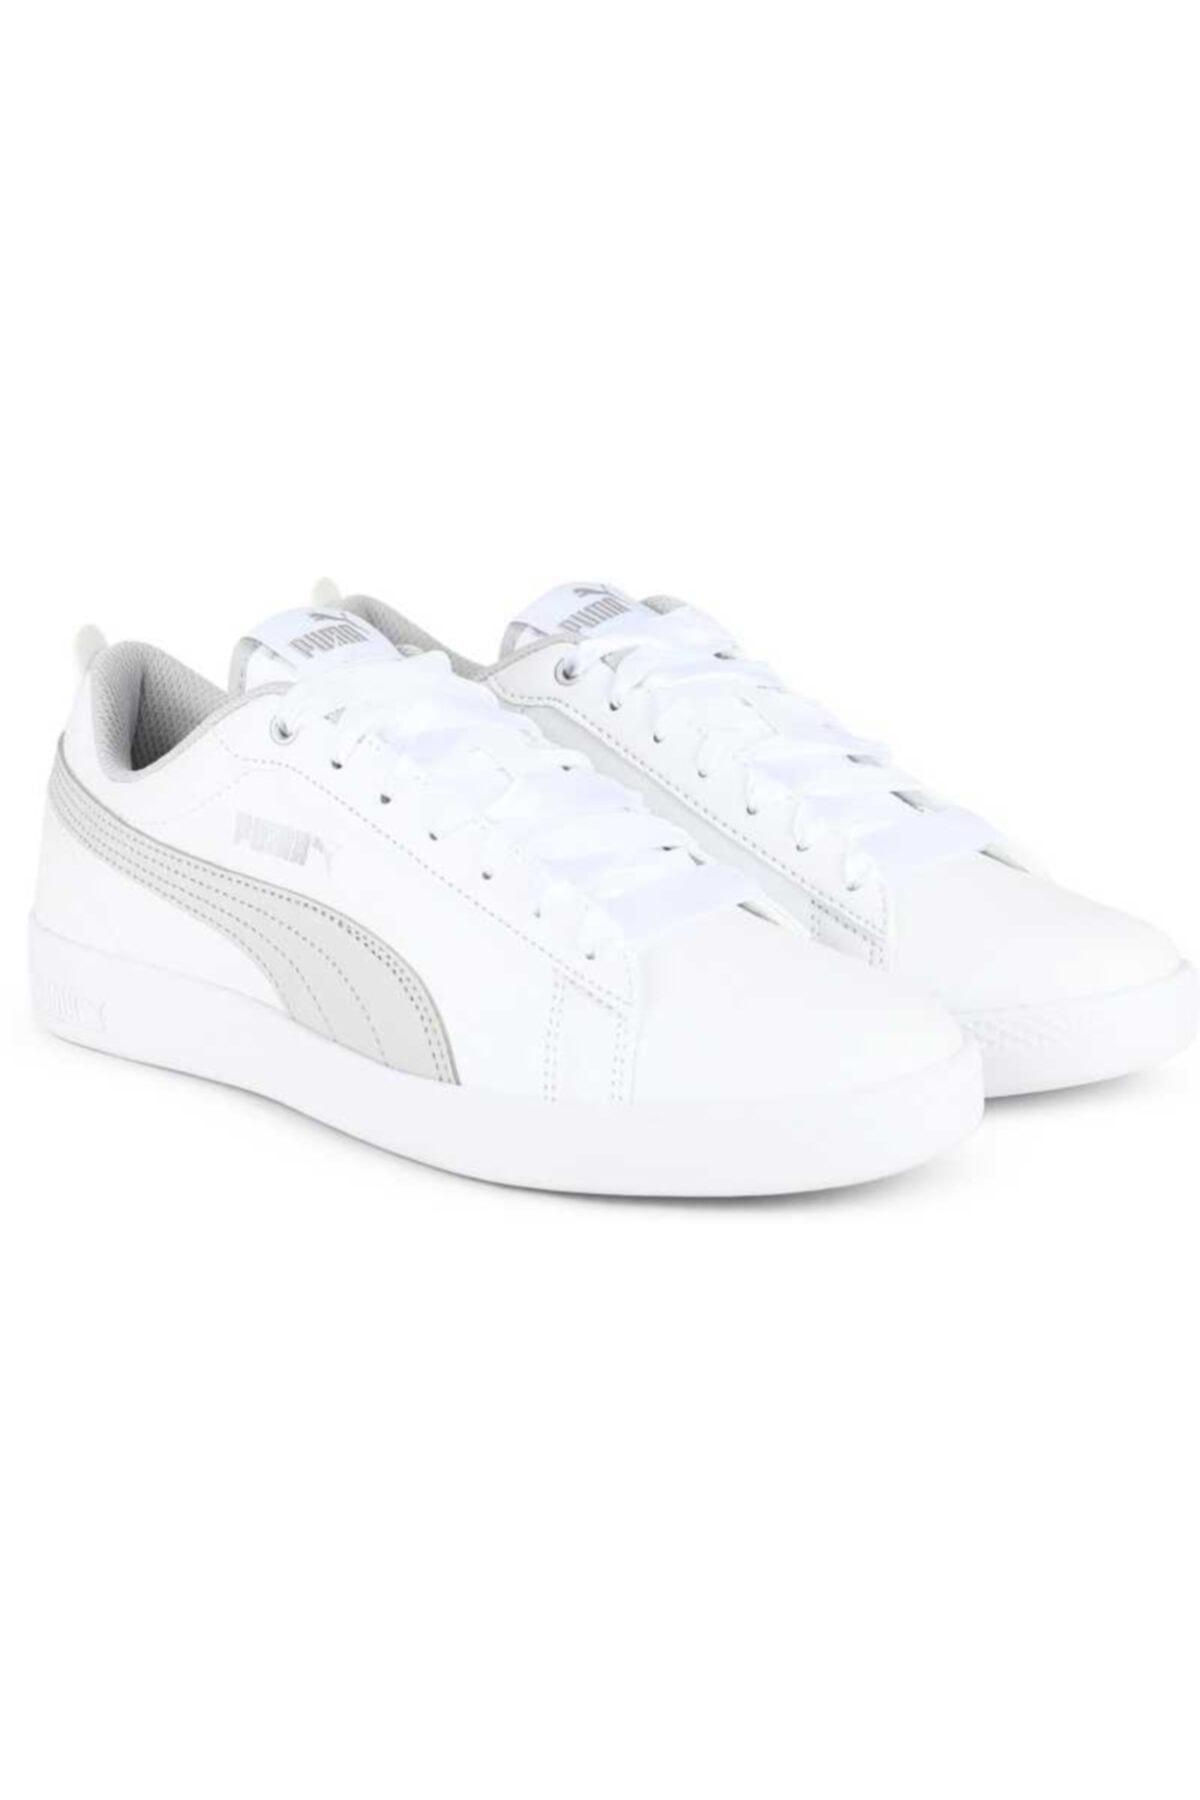 Puma Smash V2 L Unisex Günlük Ayakkabı - 36521524 1